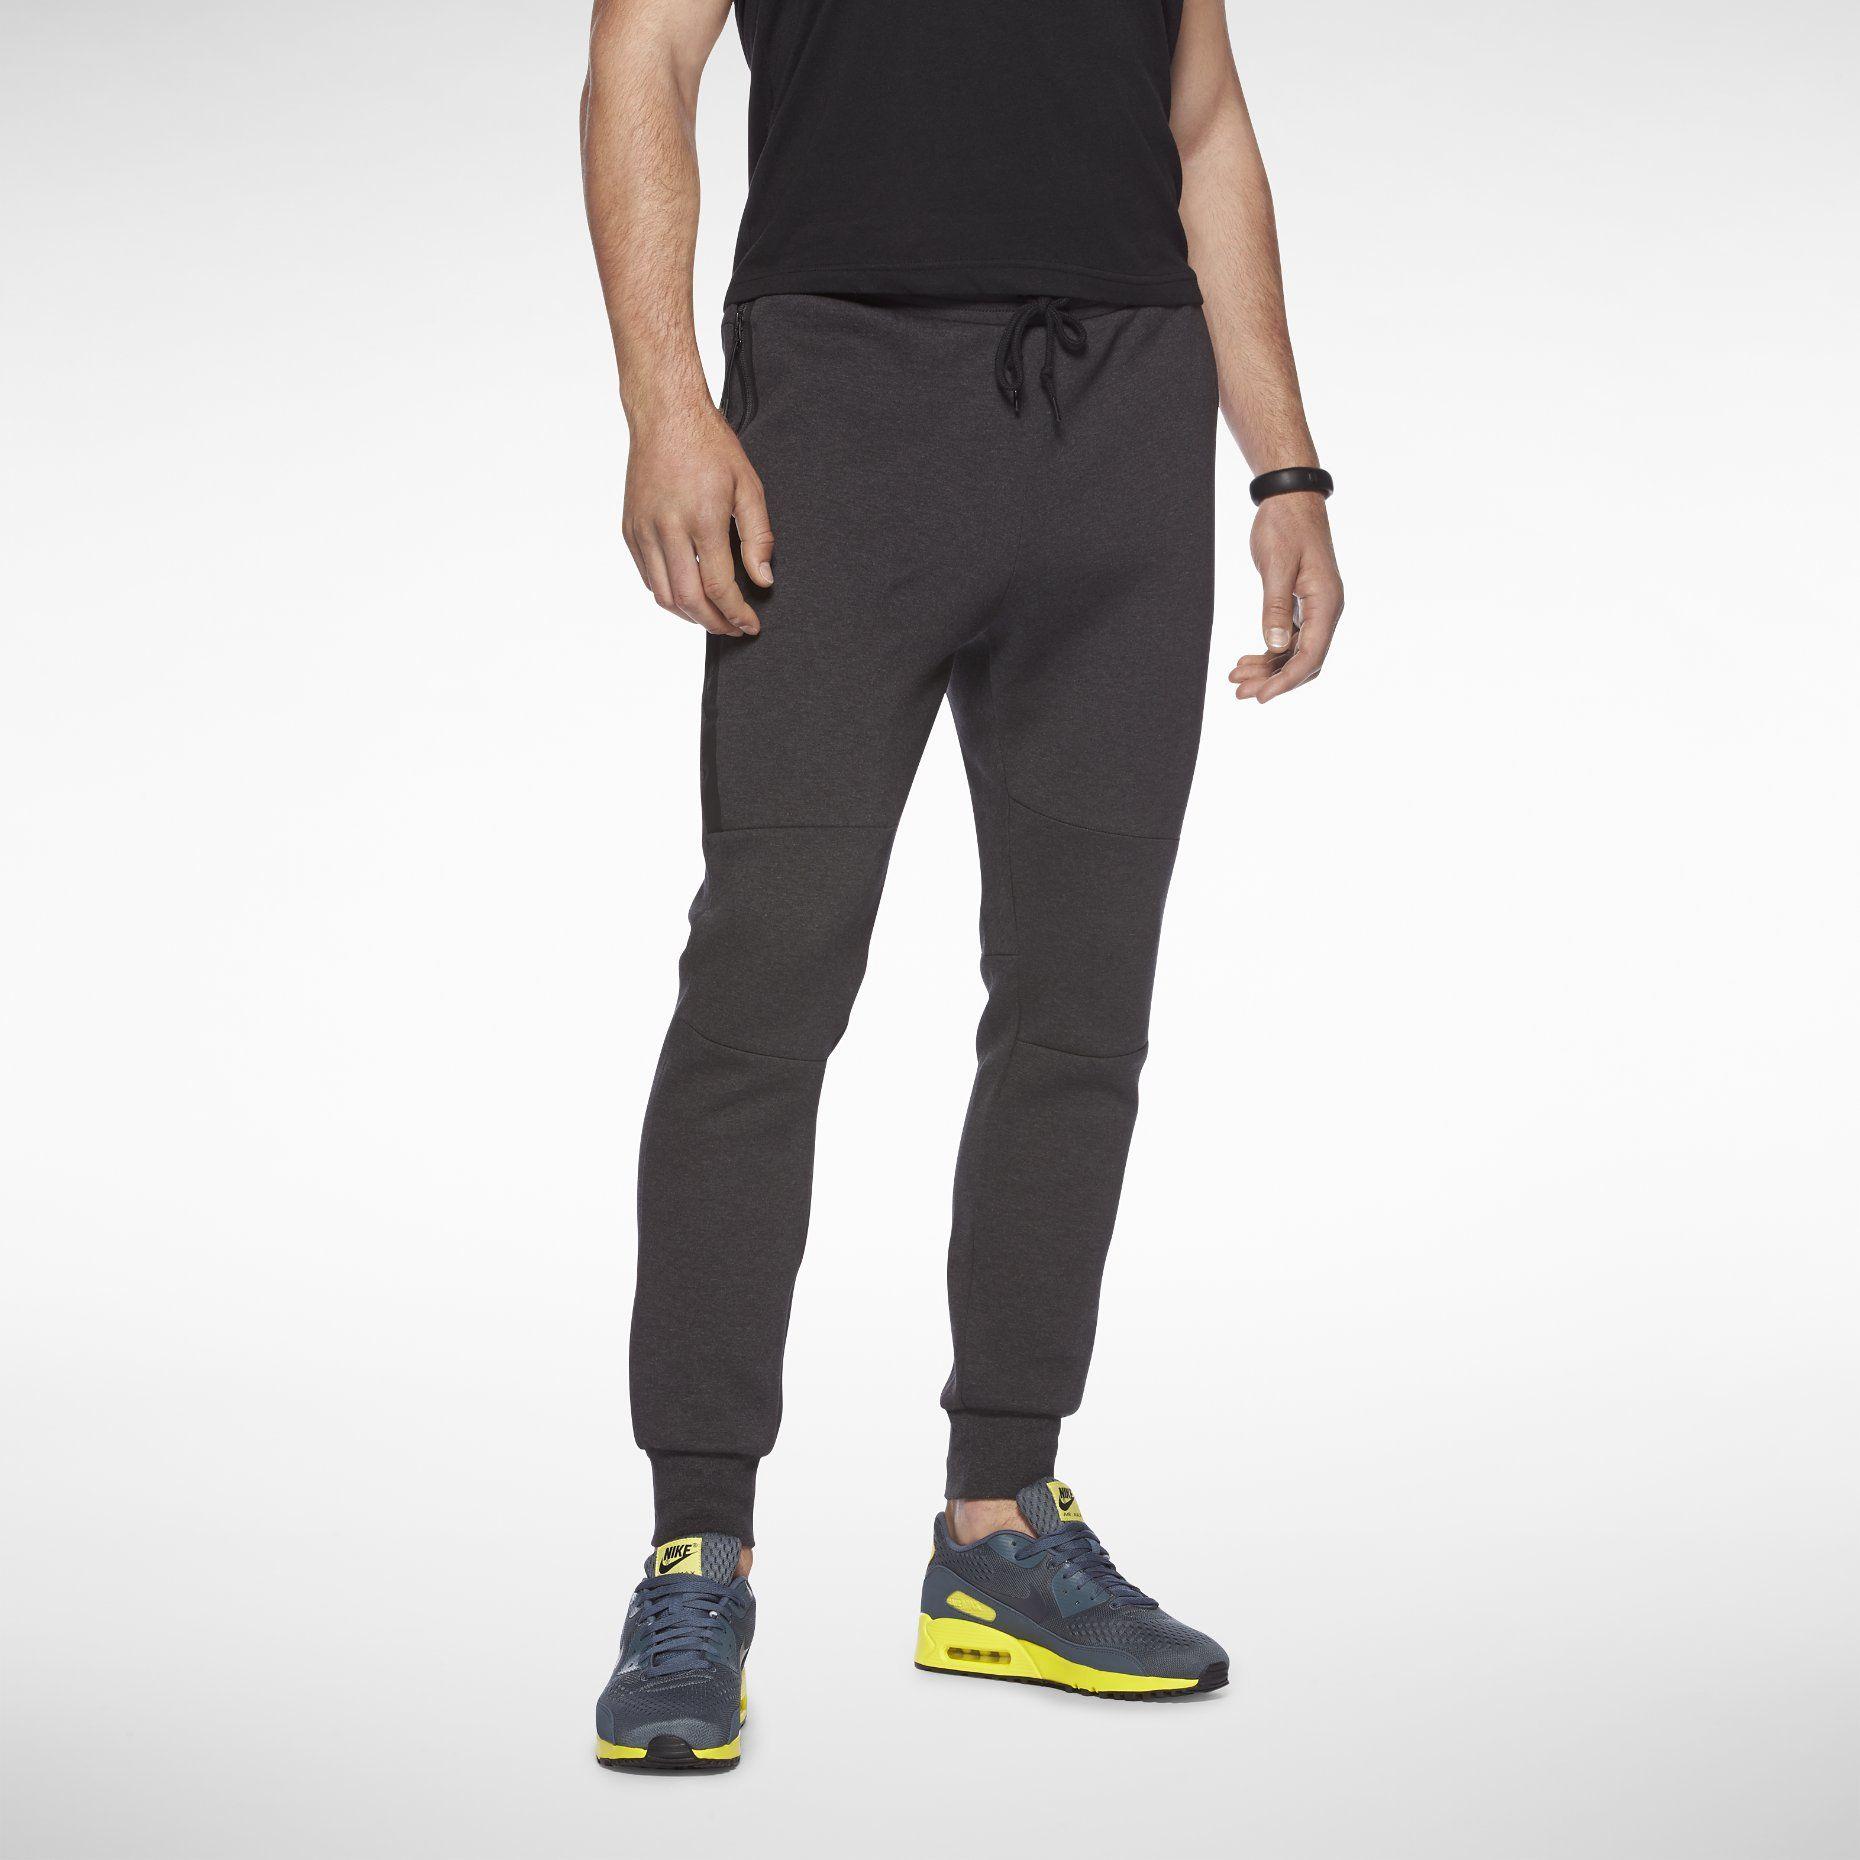 Nike store nike tech fleece mens pants nike tech